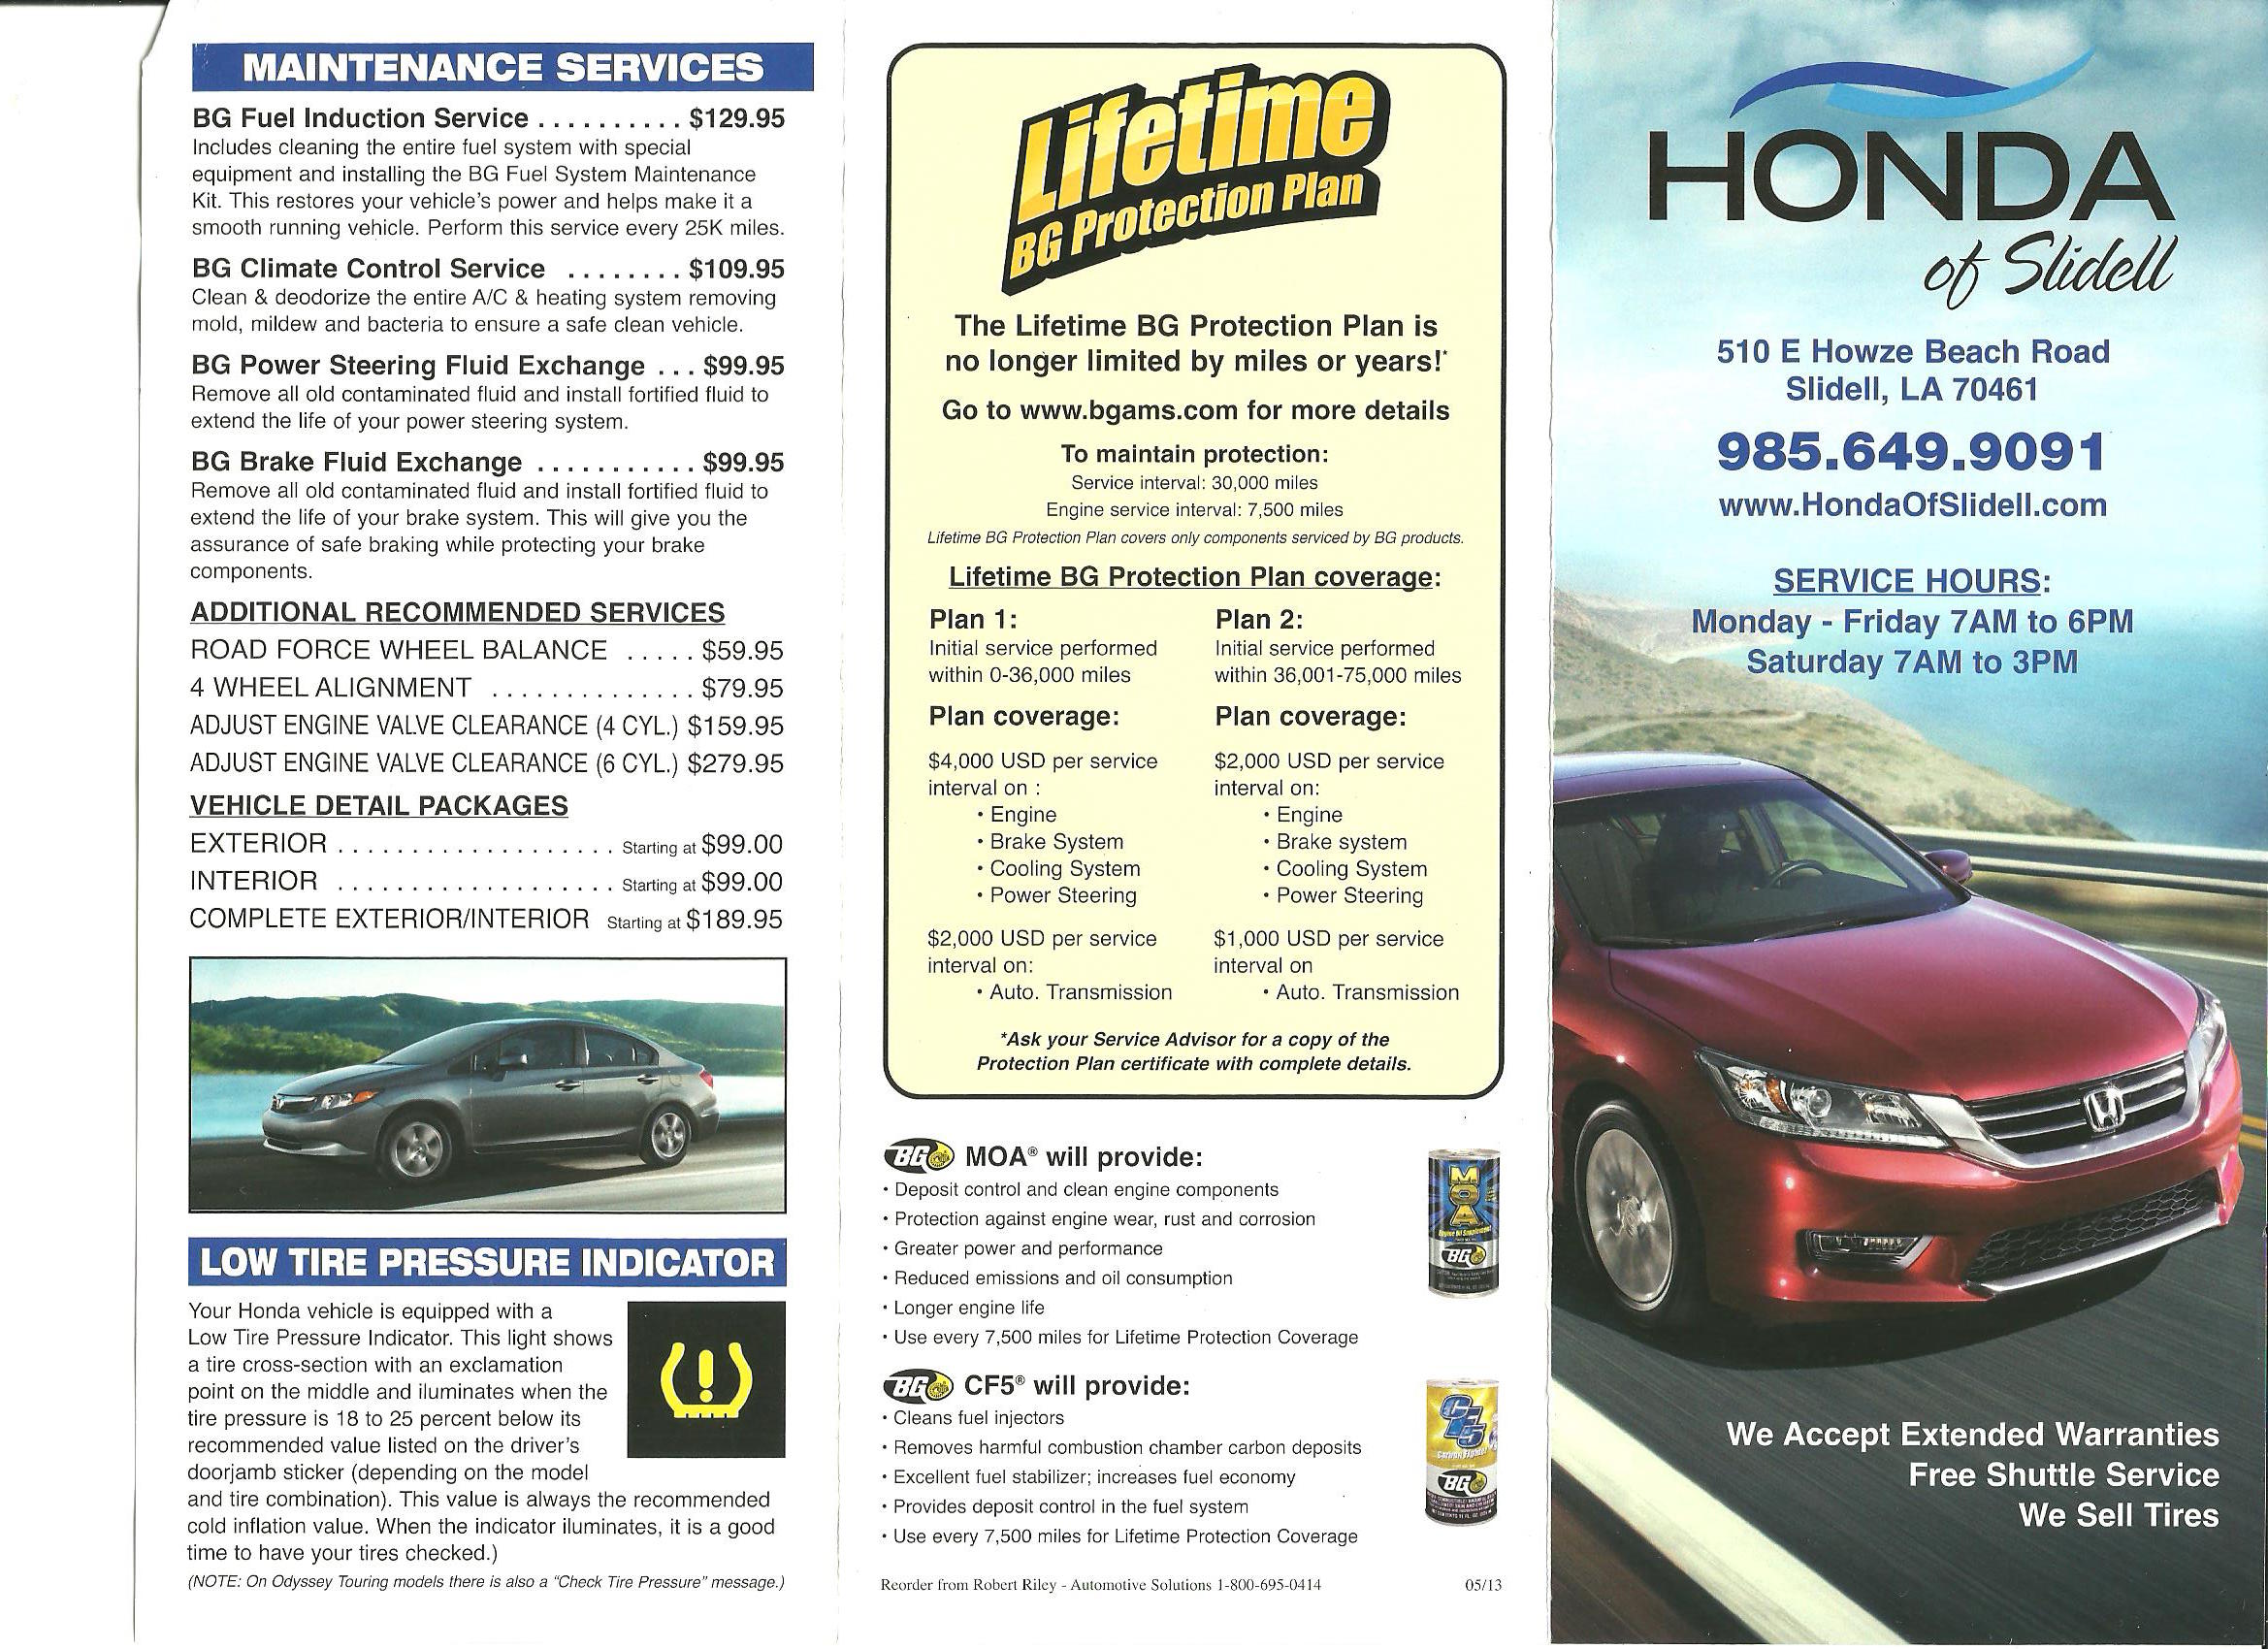 New Orleans Area Honda Service Menu